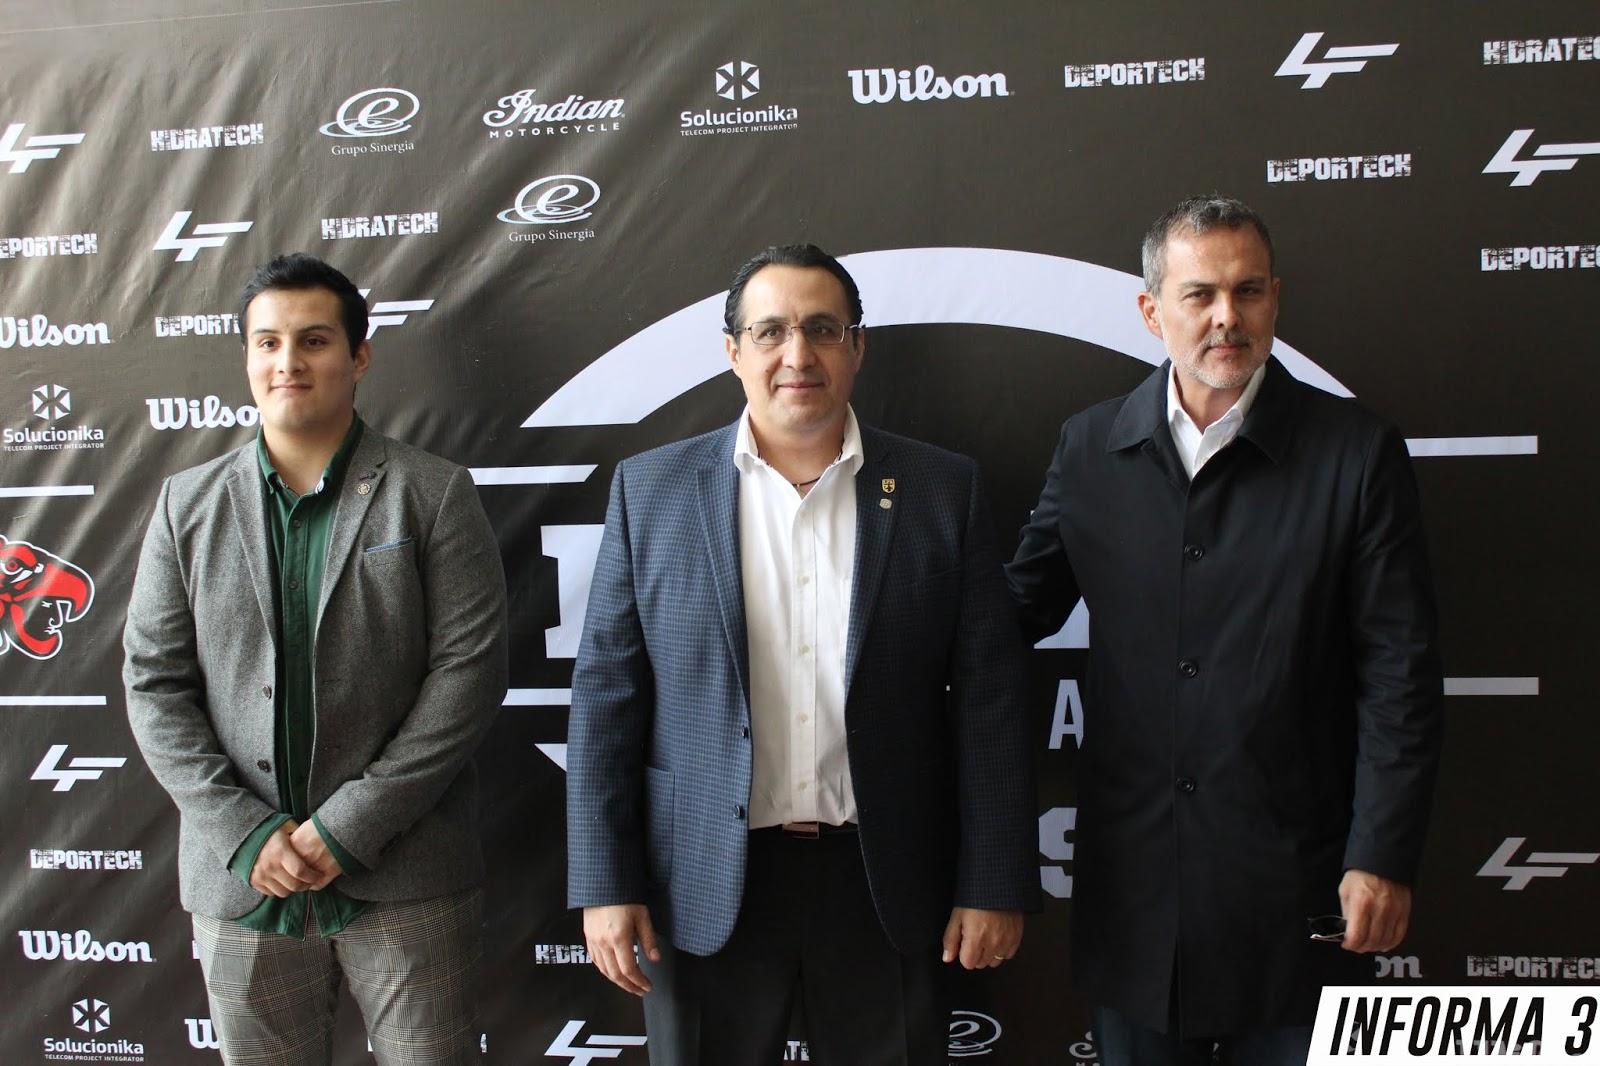 Franquiciatarios Fundidores Monterrey